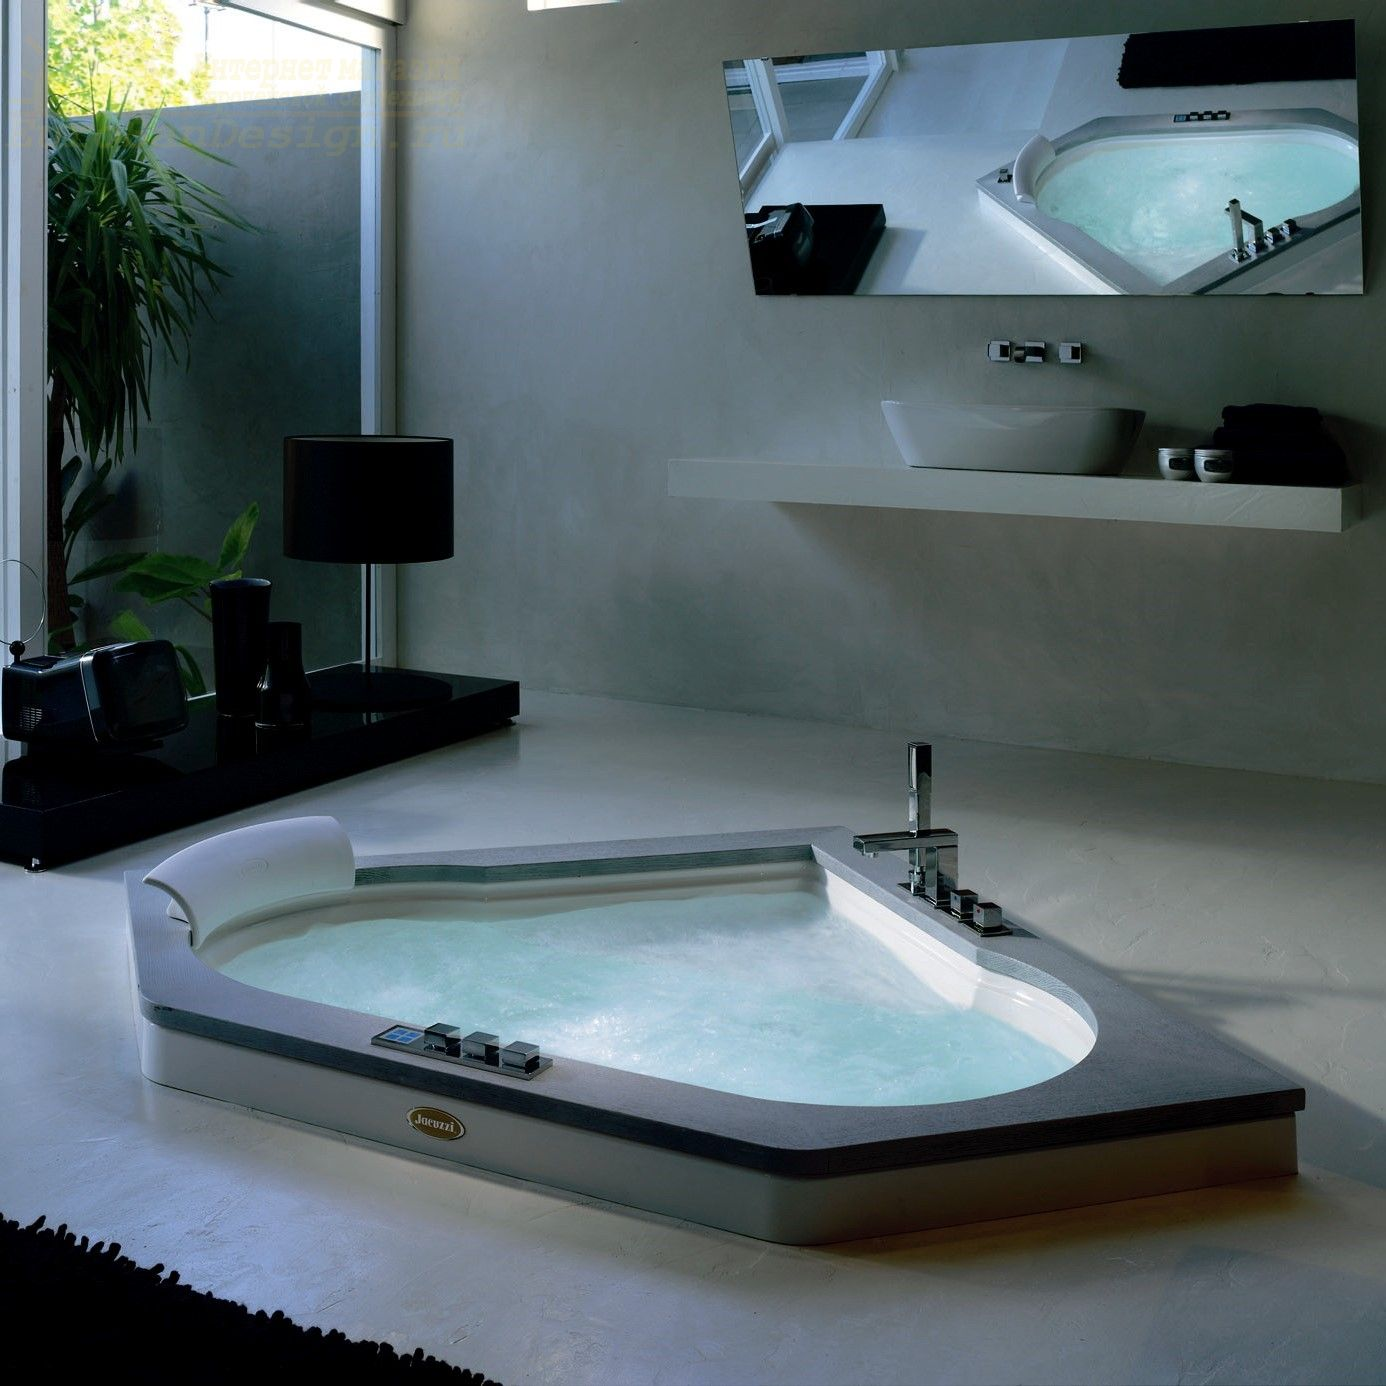 Гидромассажная ванна Jacuzzi Aura Corner 140 Stone 140x140 ФОТО